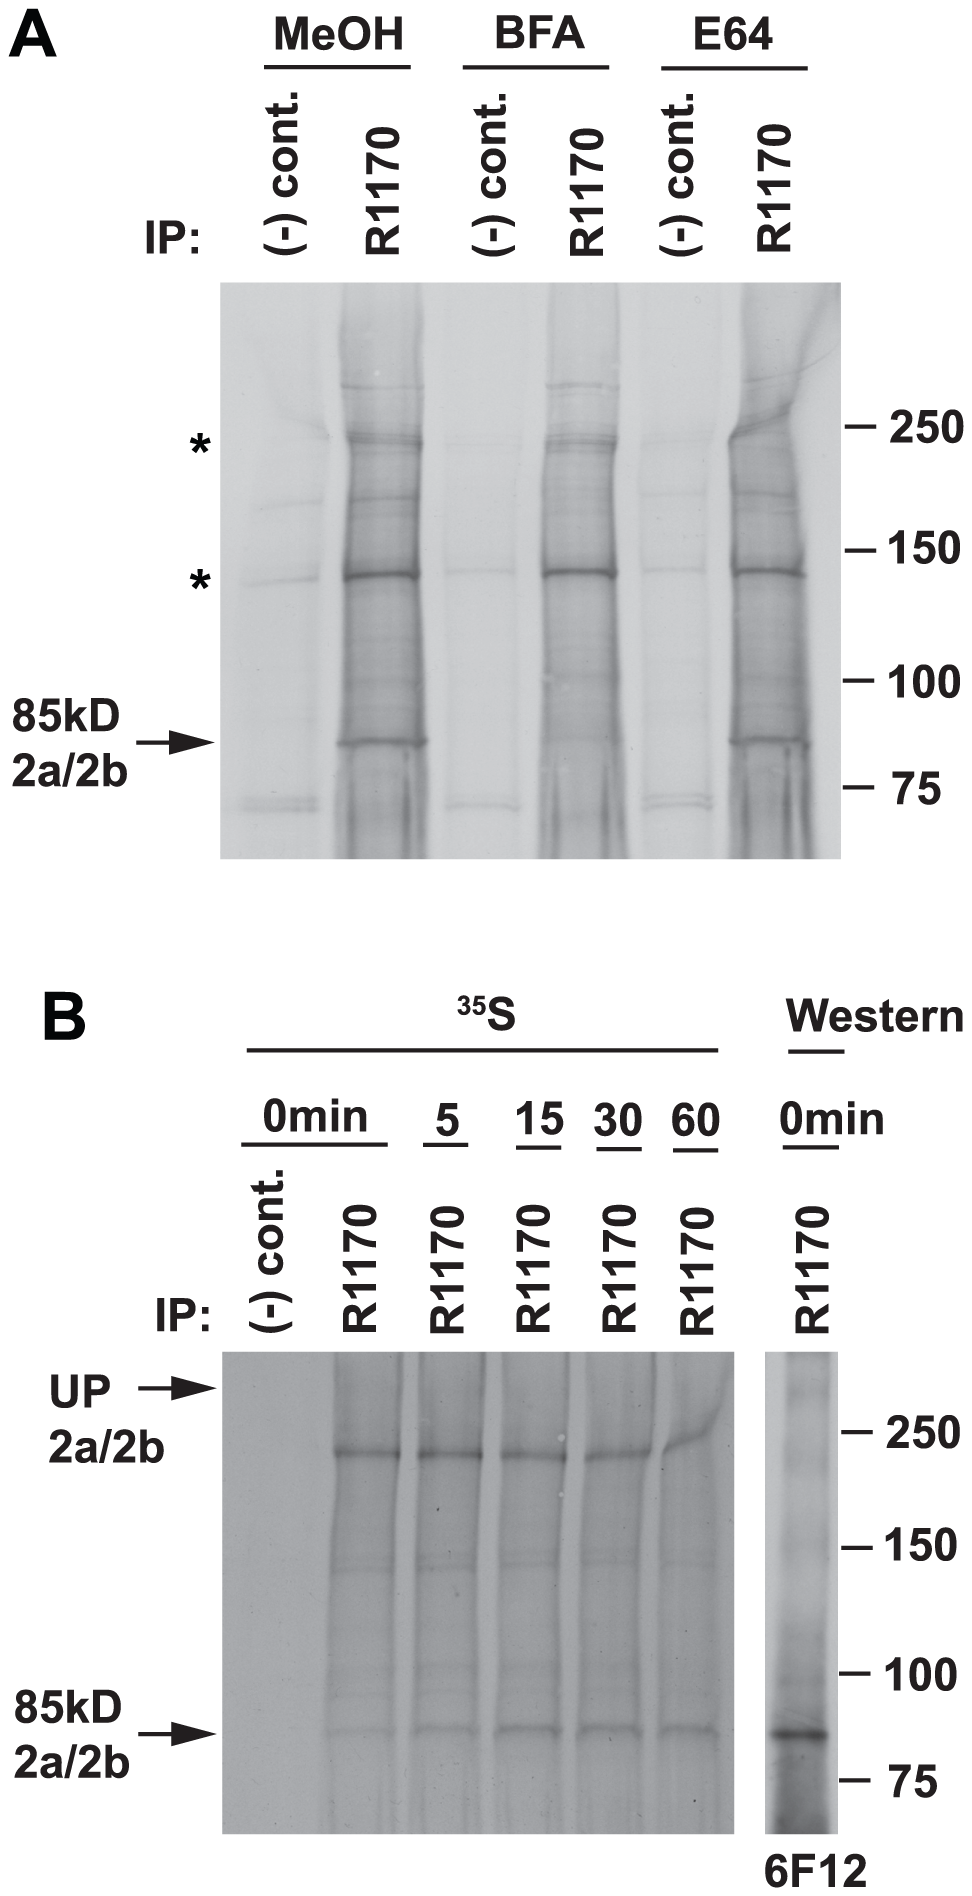 Processing of the 85 kDa fragment is brefeldin A-sensitive.